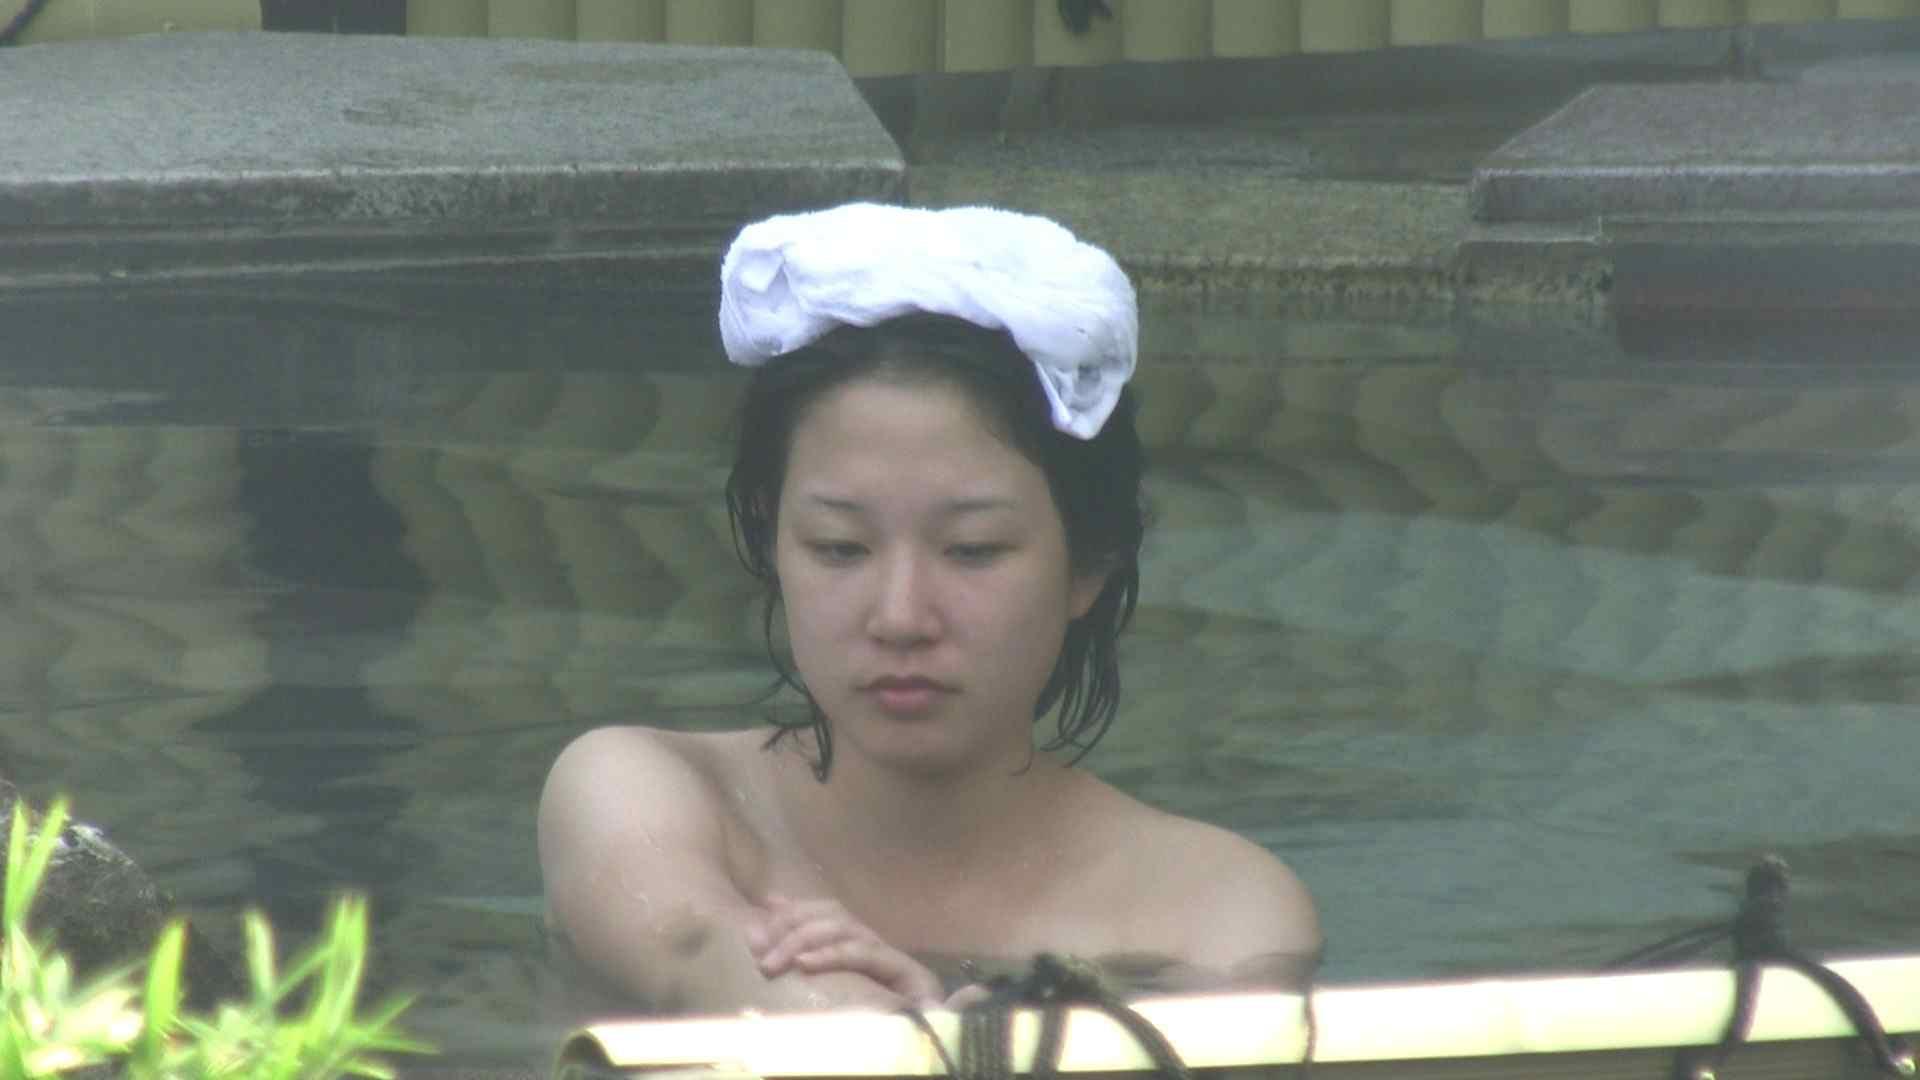 Aquaな露天風呂Vol.172 盗撮映像  113Pix 105